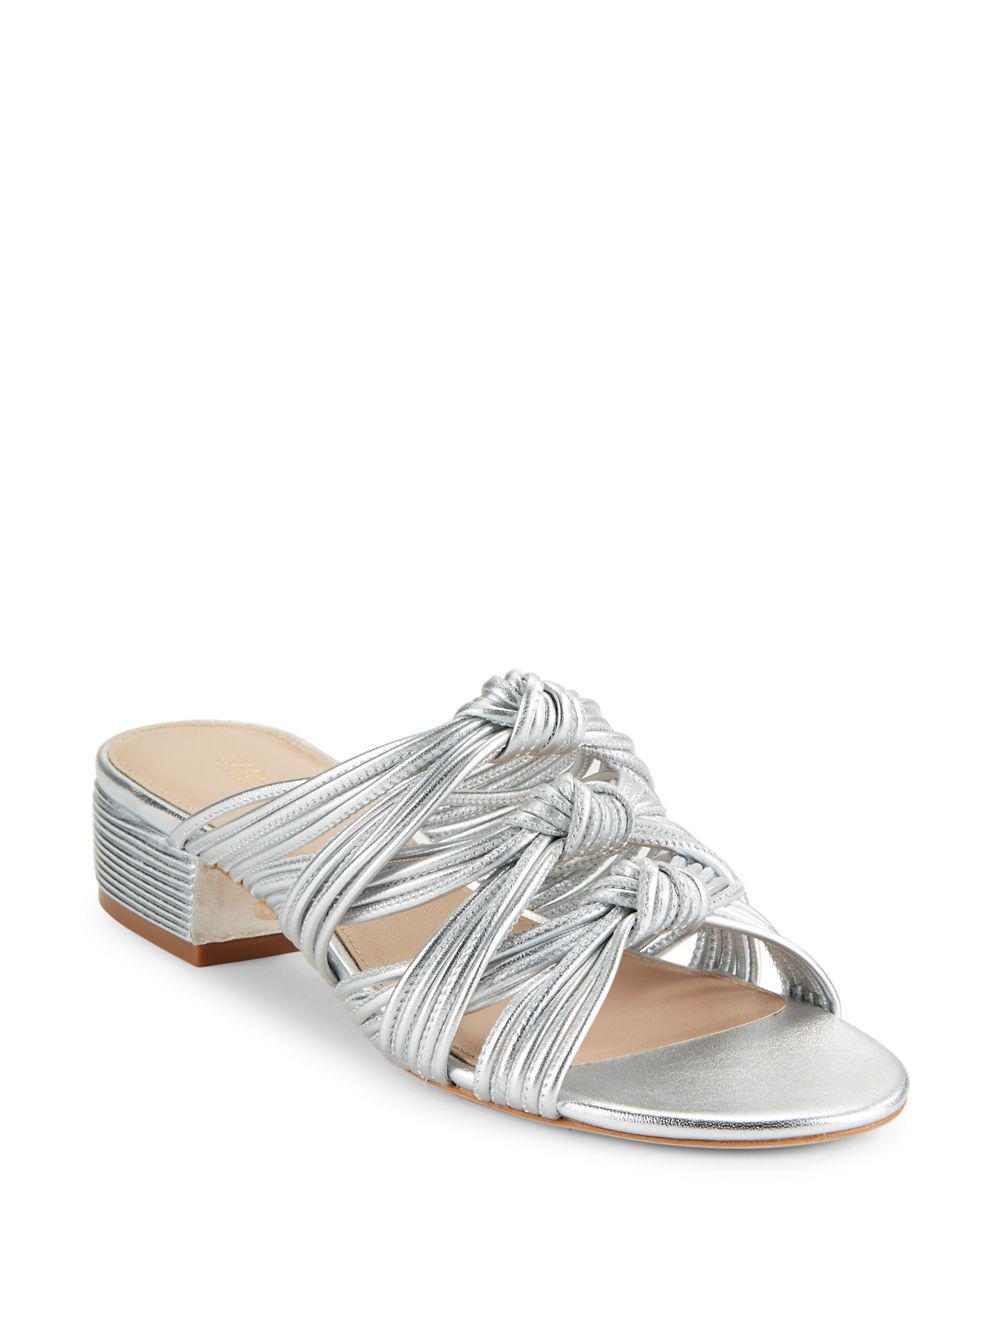 Lyst Zoe Knotted Metallic Sandals Leather Wren Rachel In qpMSUzVG